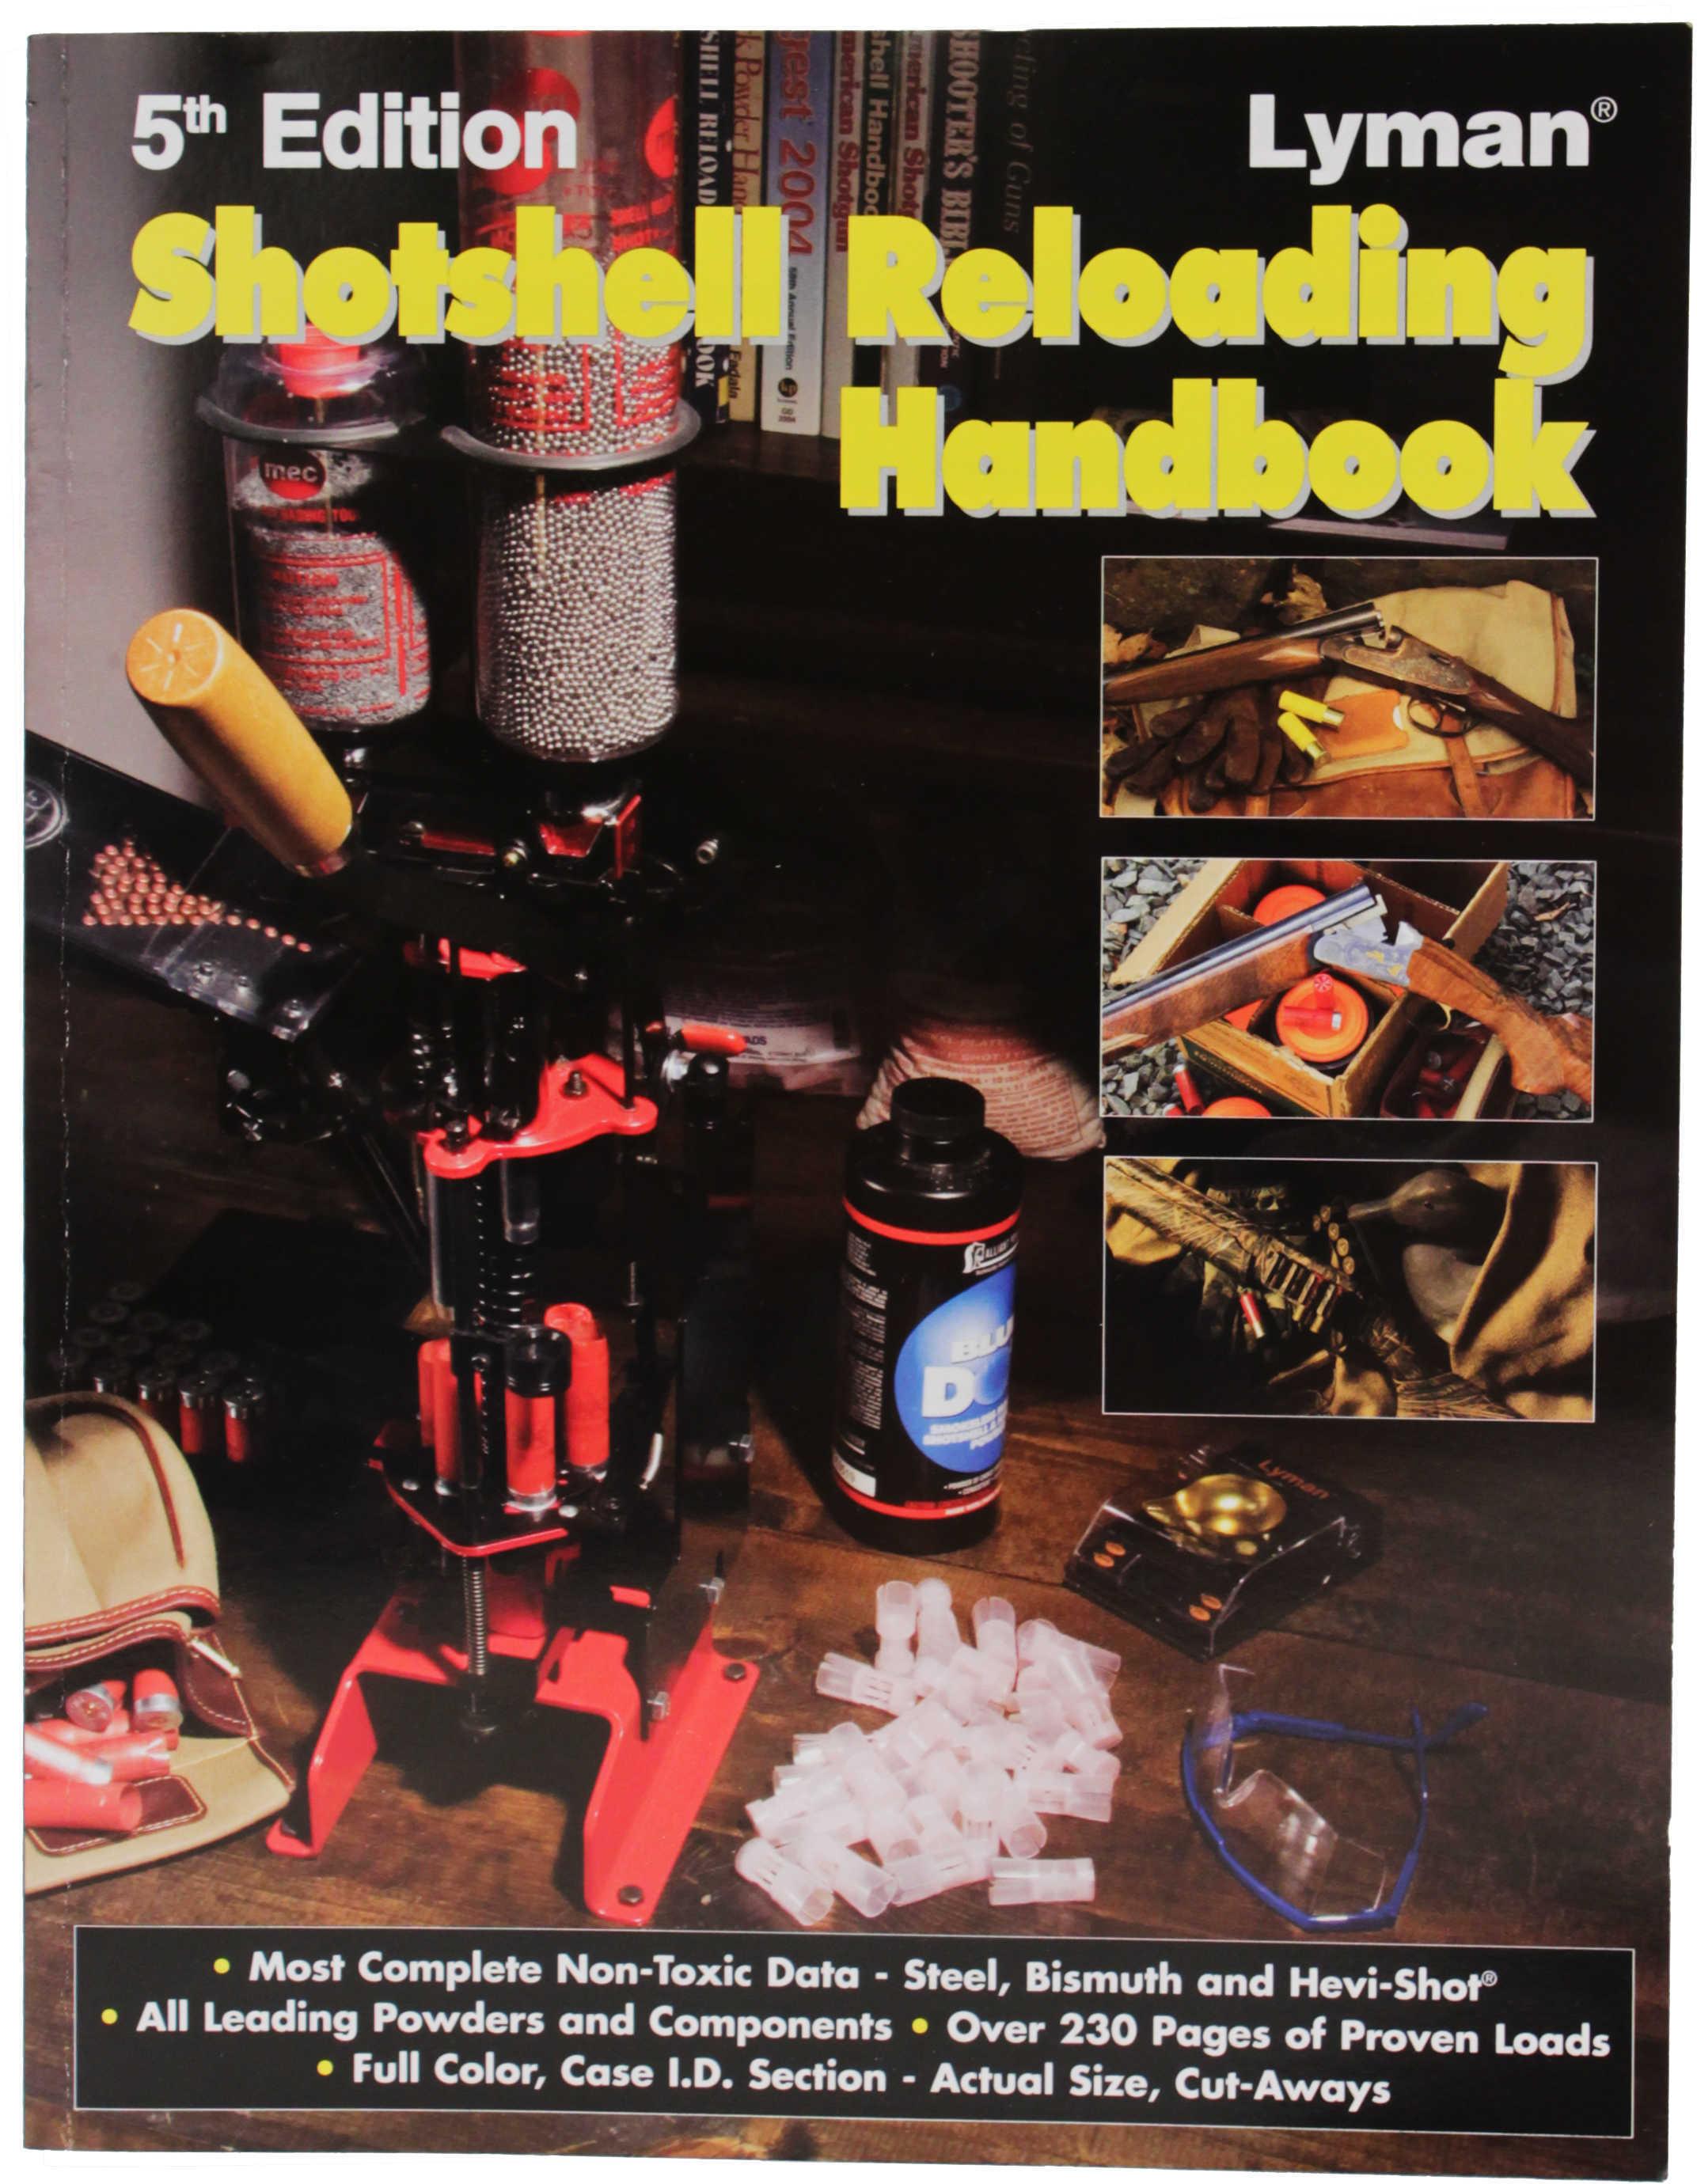 Lyman 5Th Edition Shot Shell Reloading Book 9827111